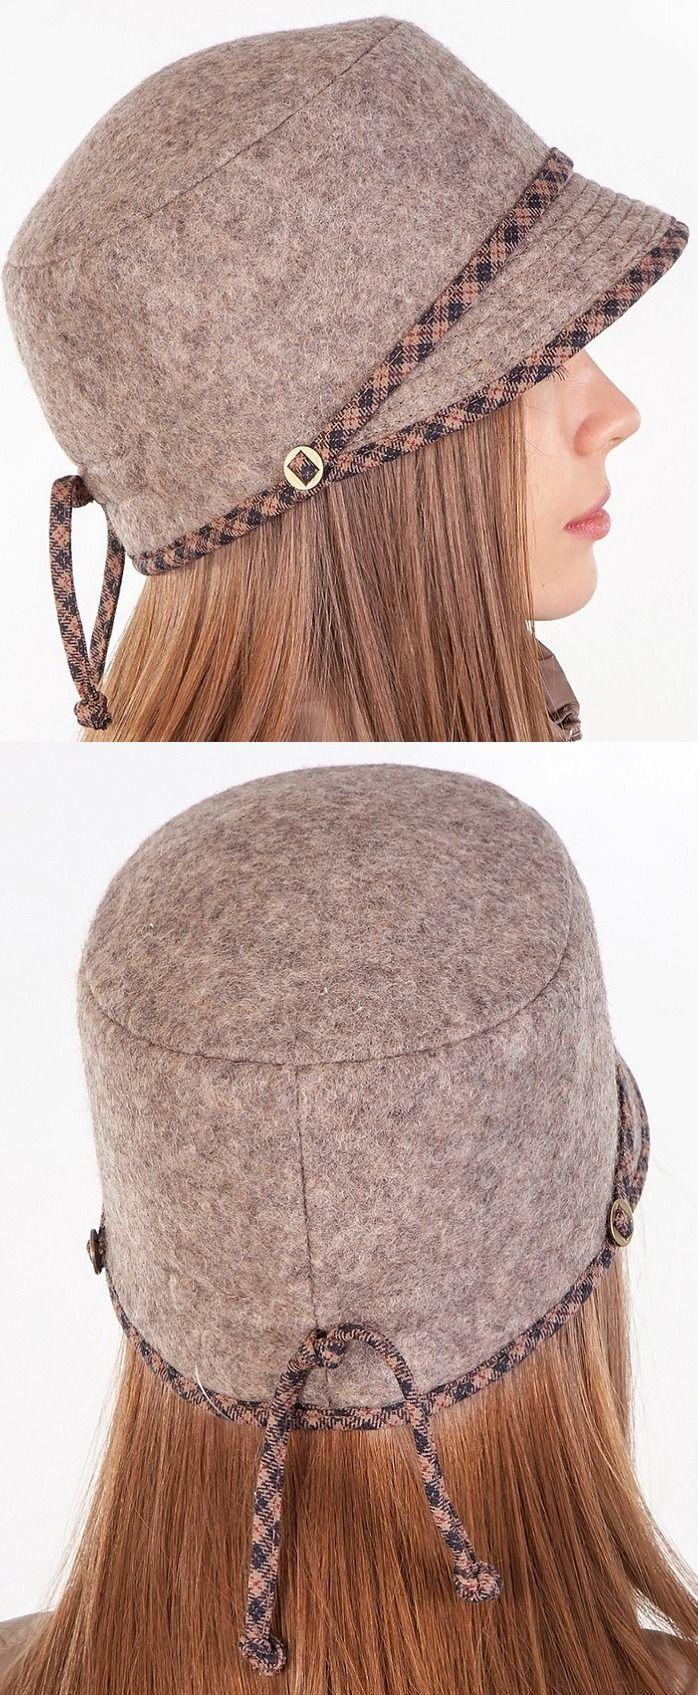 Шляпка   Сделай сам   Pinterest   Hüte, Mütze und Hut-Muster